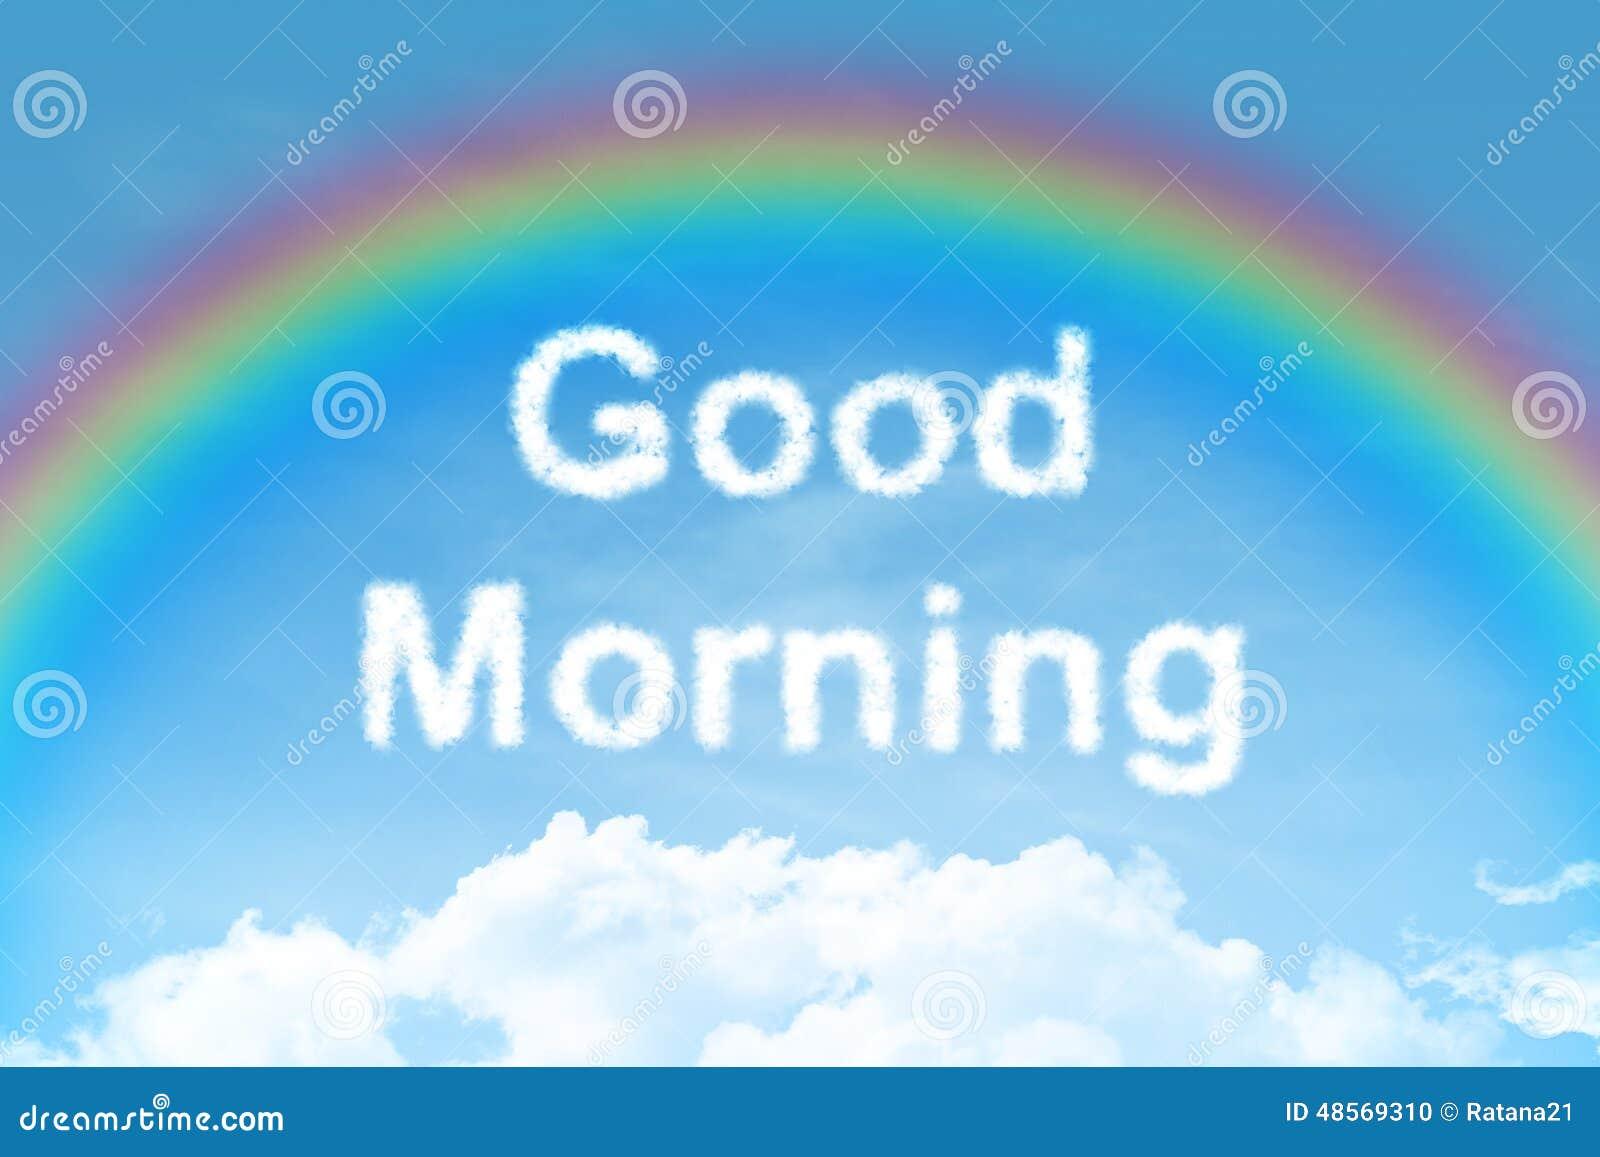 Good Morning Vietnam Z Rainbow : Good morning cloud text with rainbow stock photo image